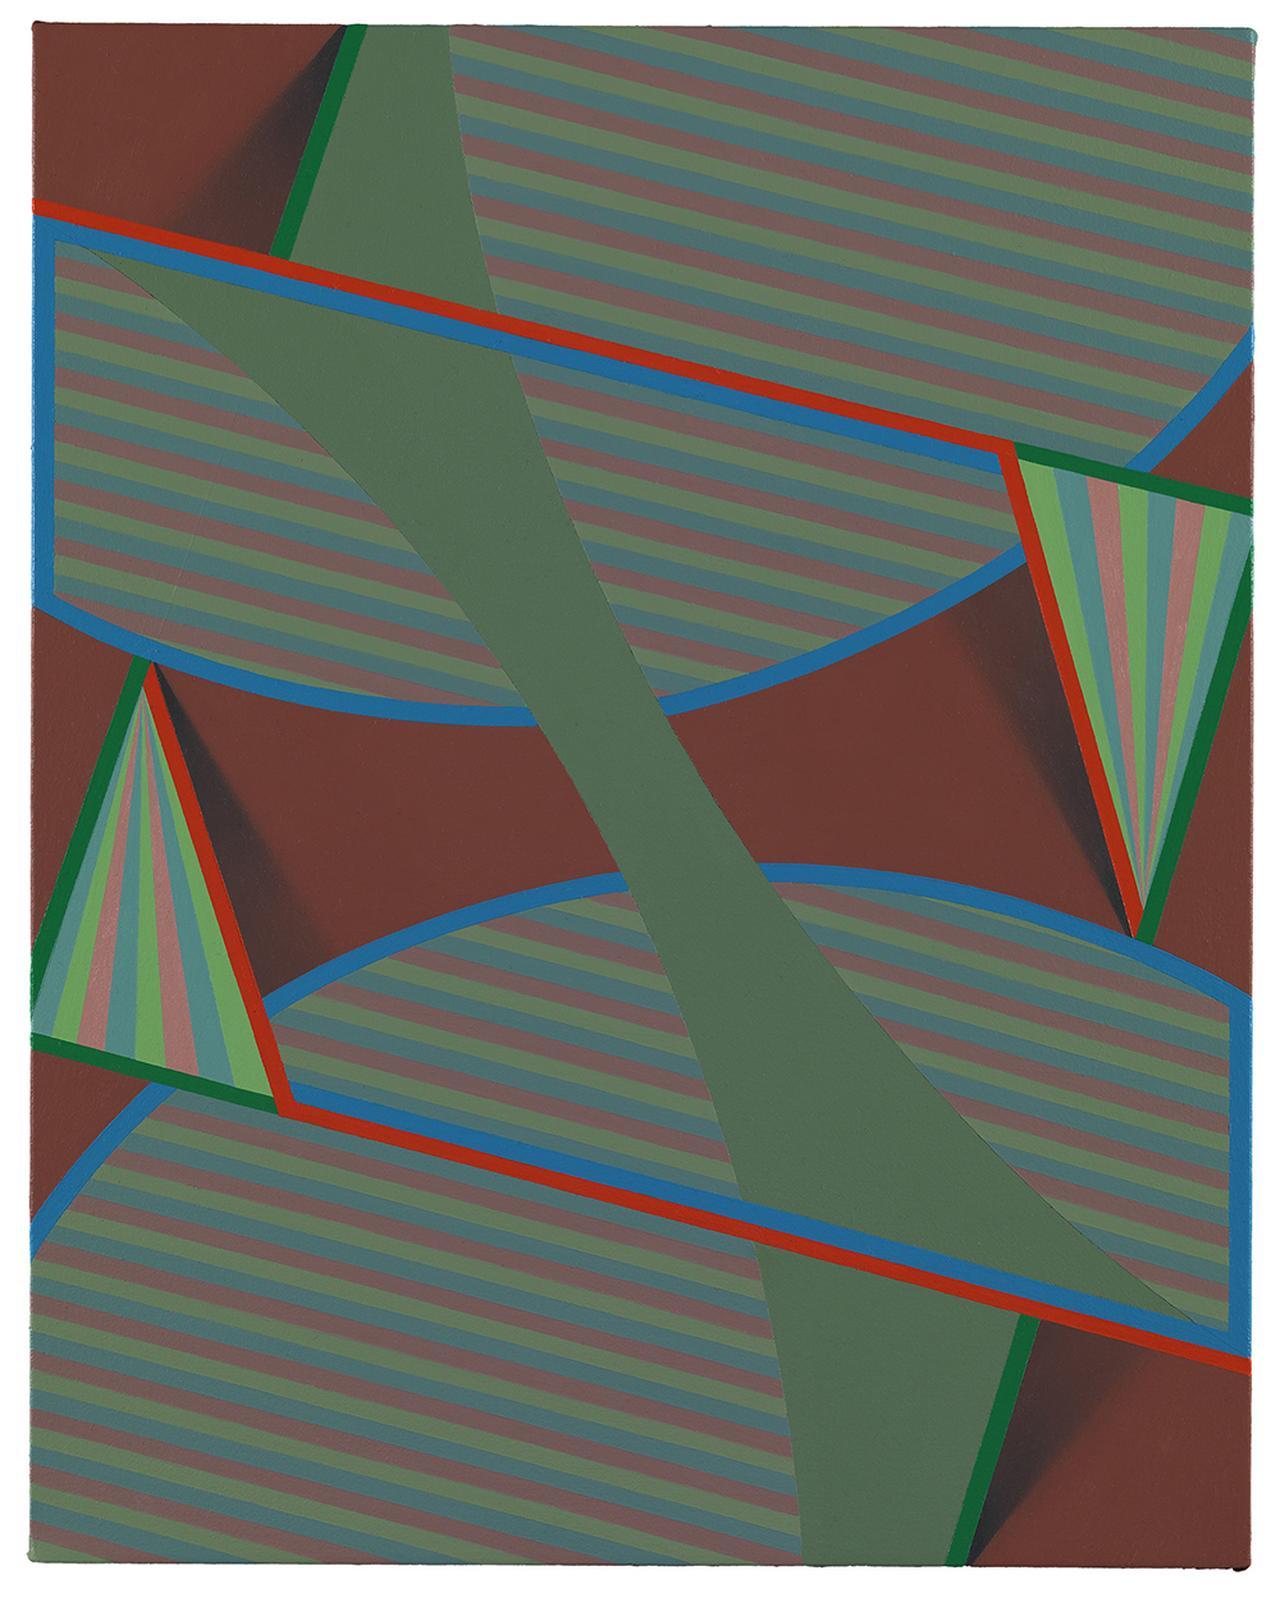 Images : 『抽象世界』|国立国際美術館